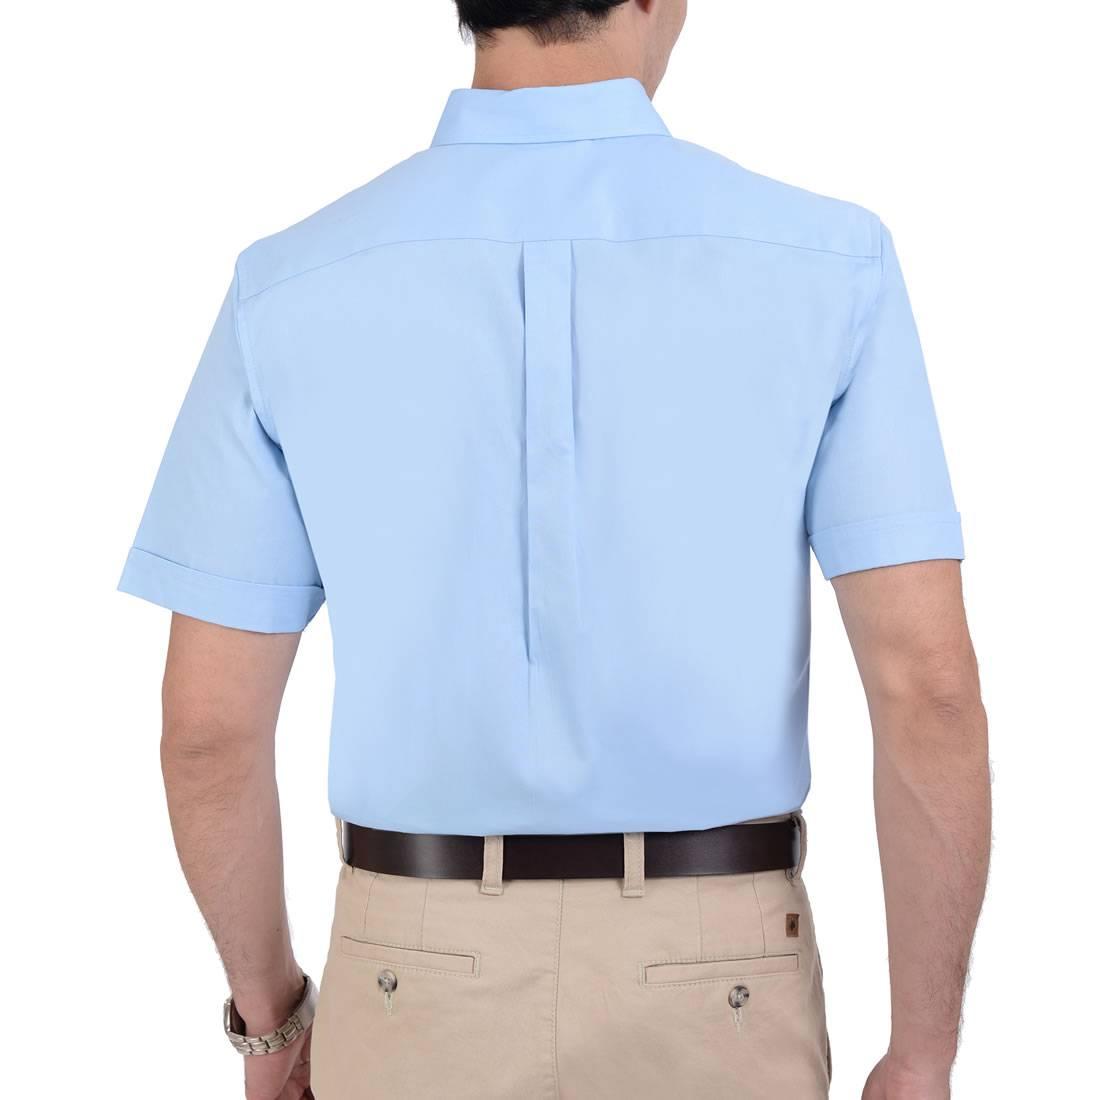 042331381711-03-Camisa-Manga-Corta-classic-Fit-Azul-Cielo-yale